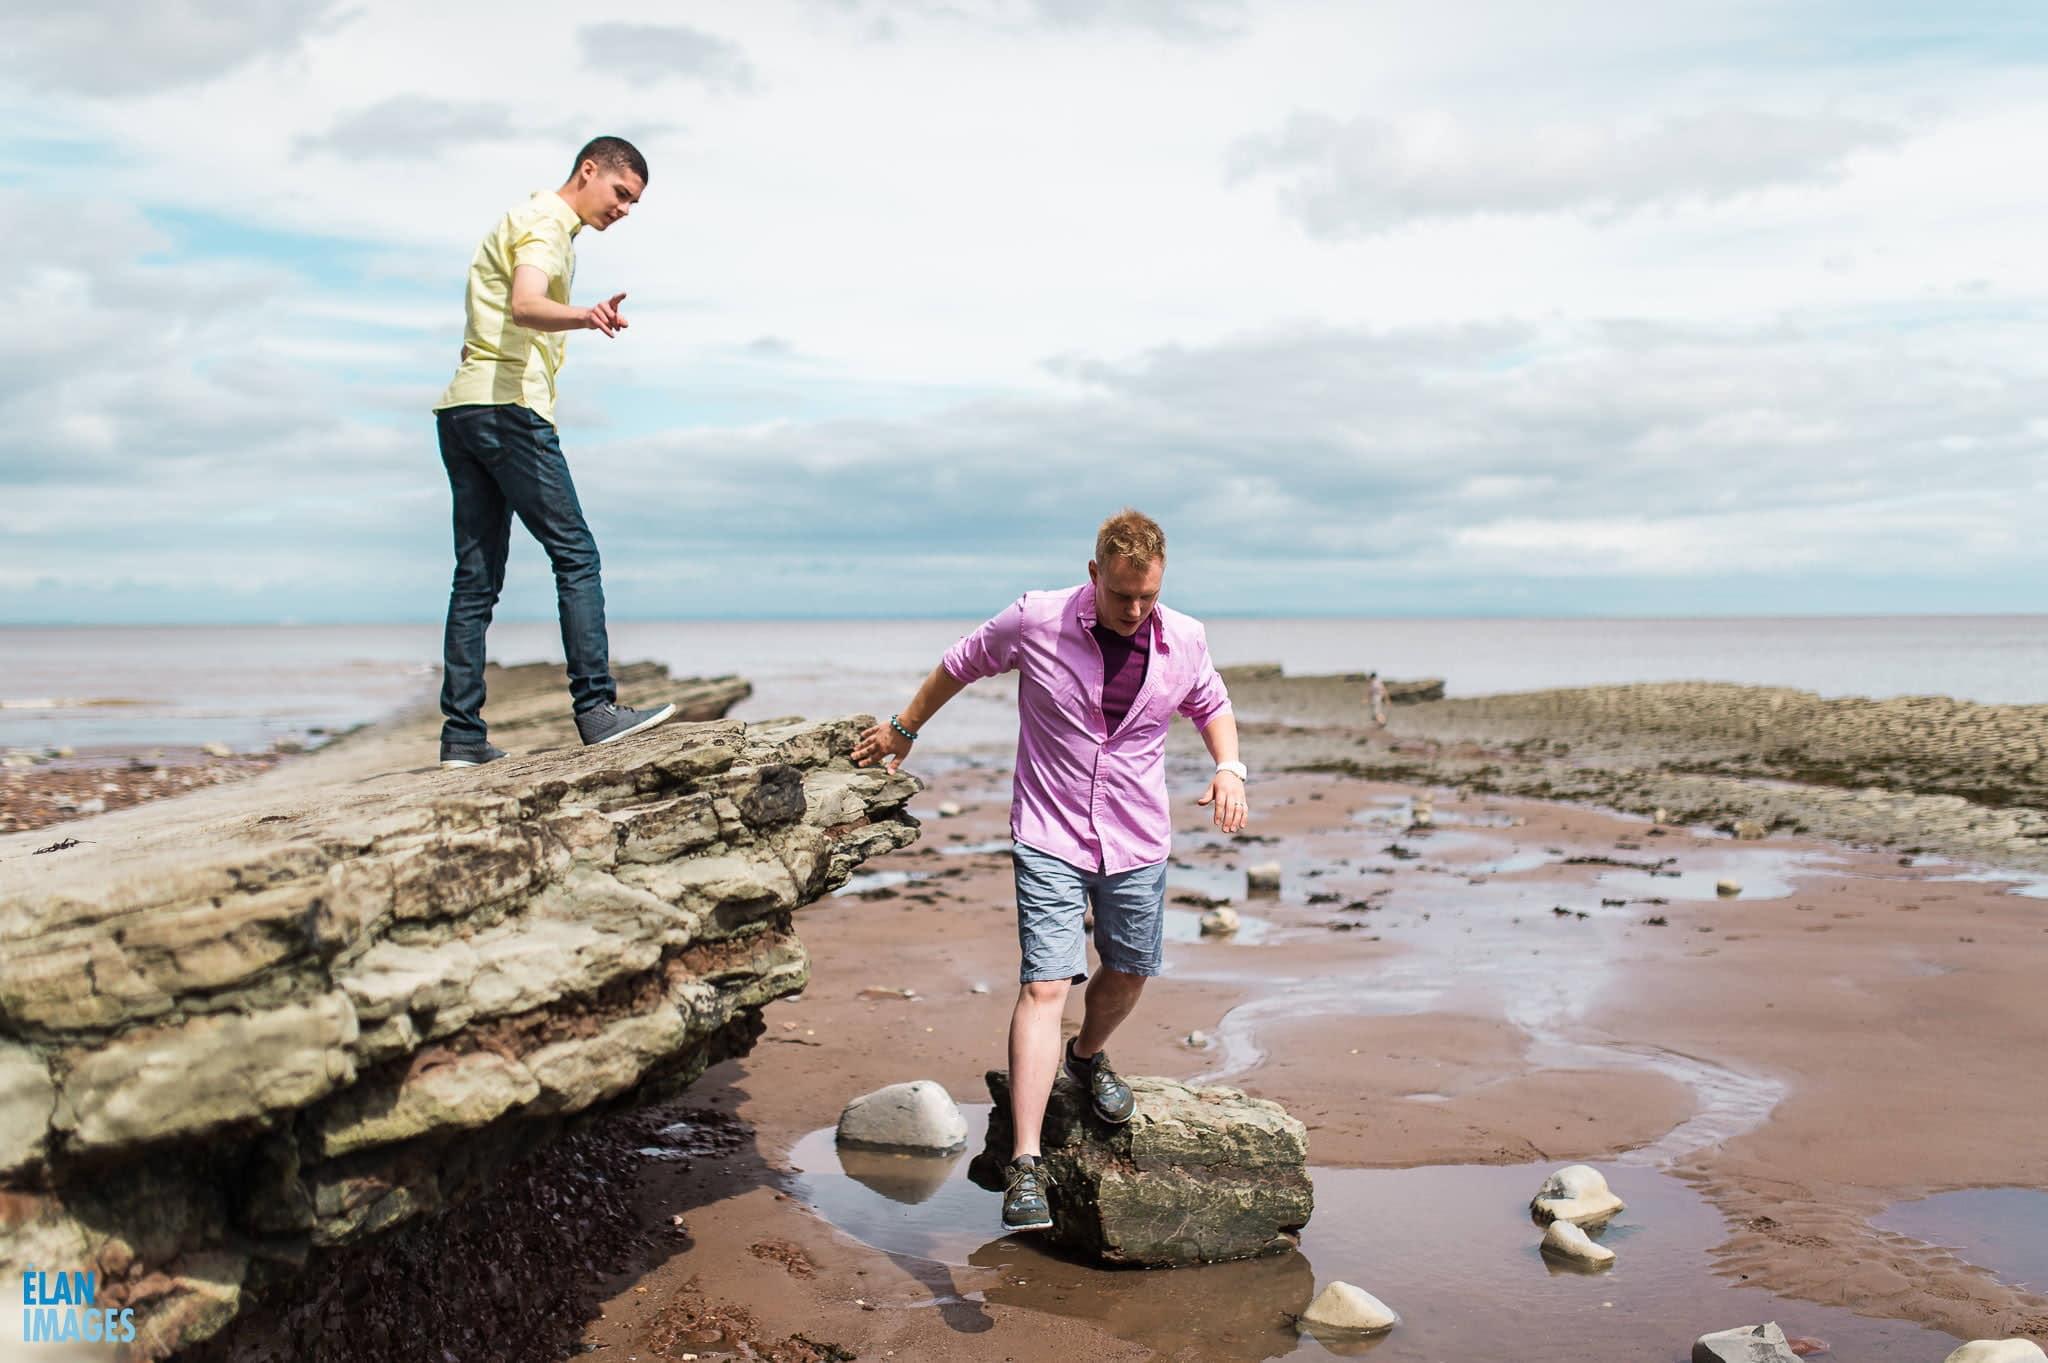 Engagement photo shoot at St Audrie's Bay, Devon 30